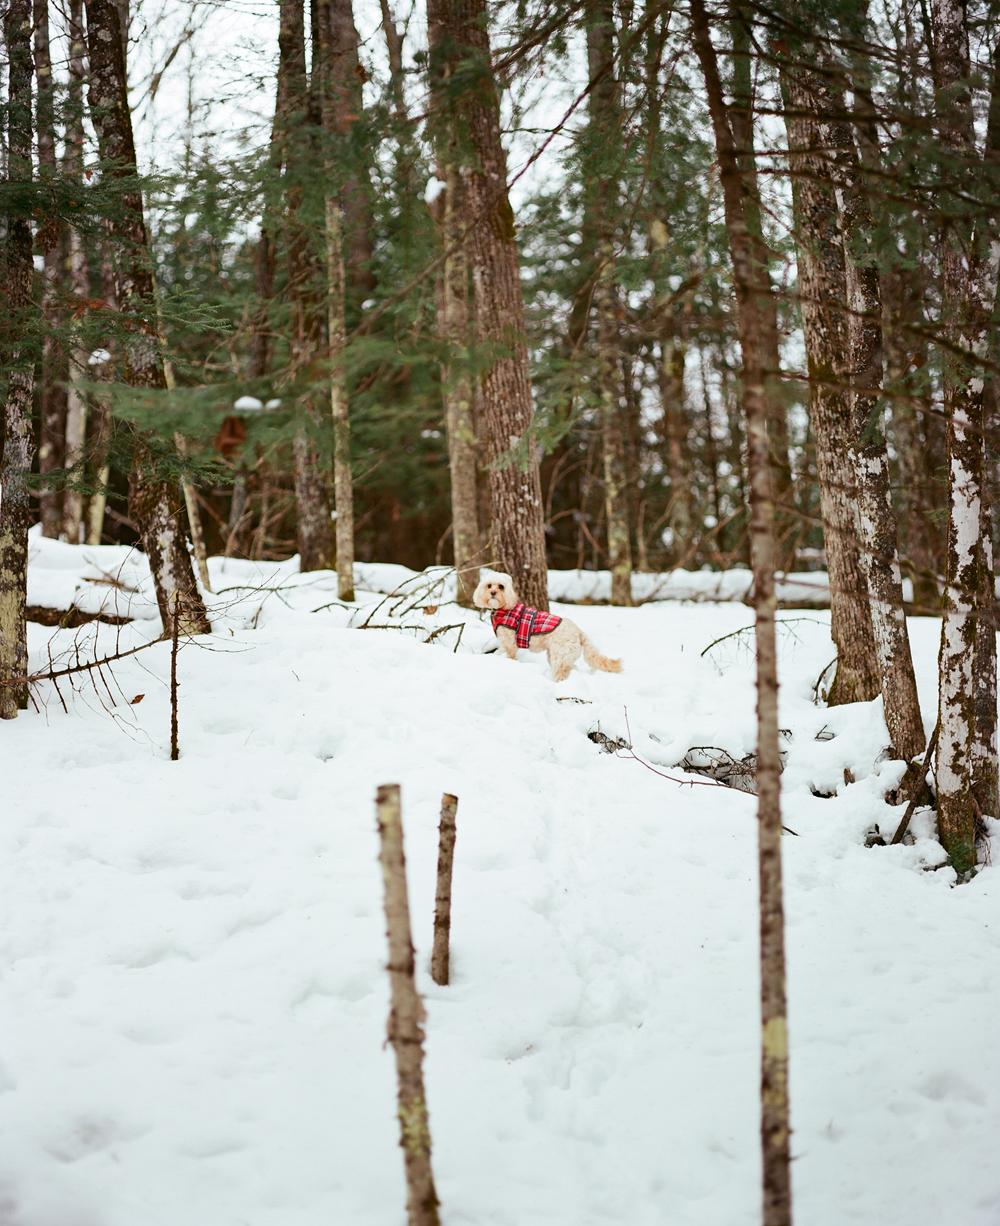 northern-wisconsin-snowshoe-002.jpg